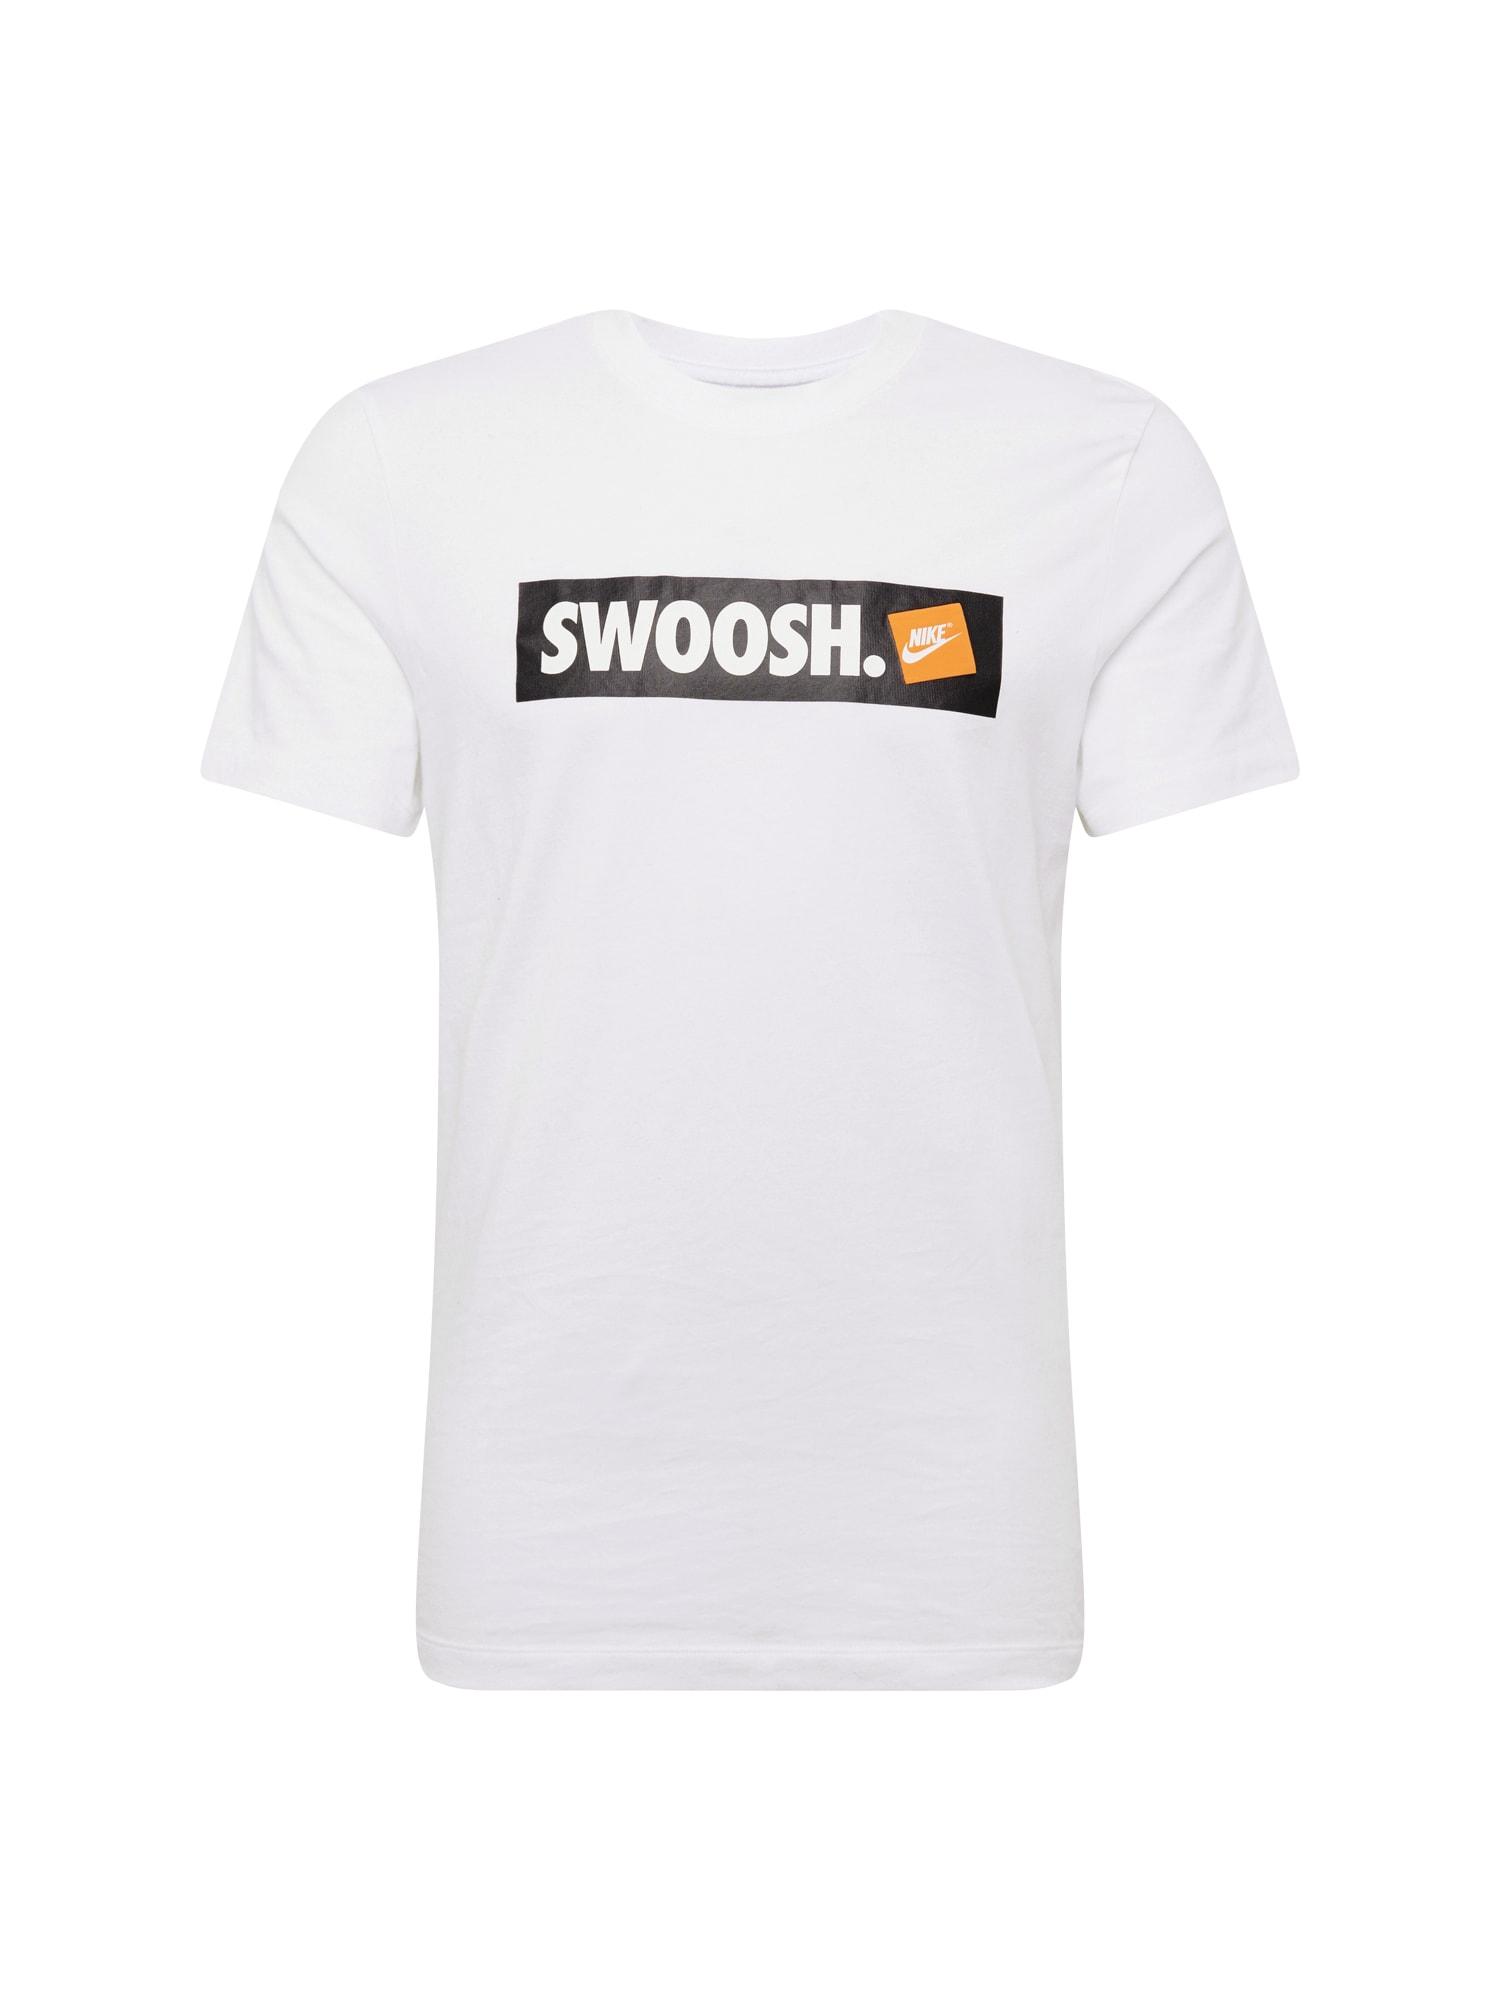 Tričko M NSW TEE SWOOSH BMPR STKR černá bílá Nike Sportswear